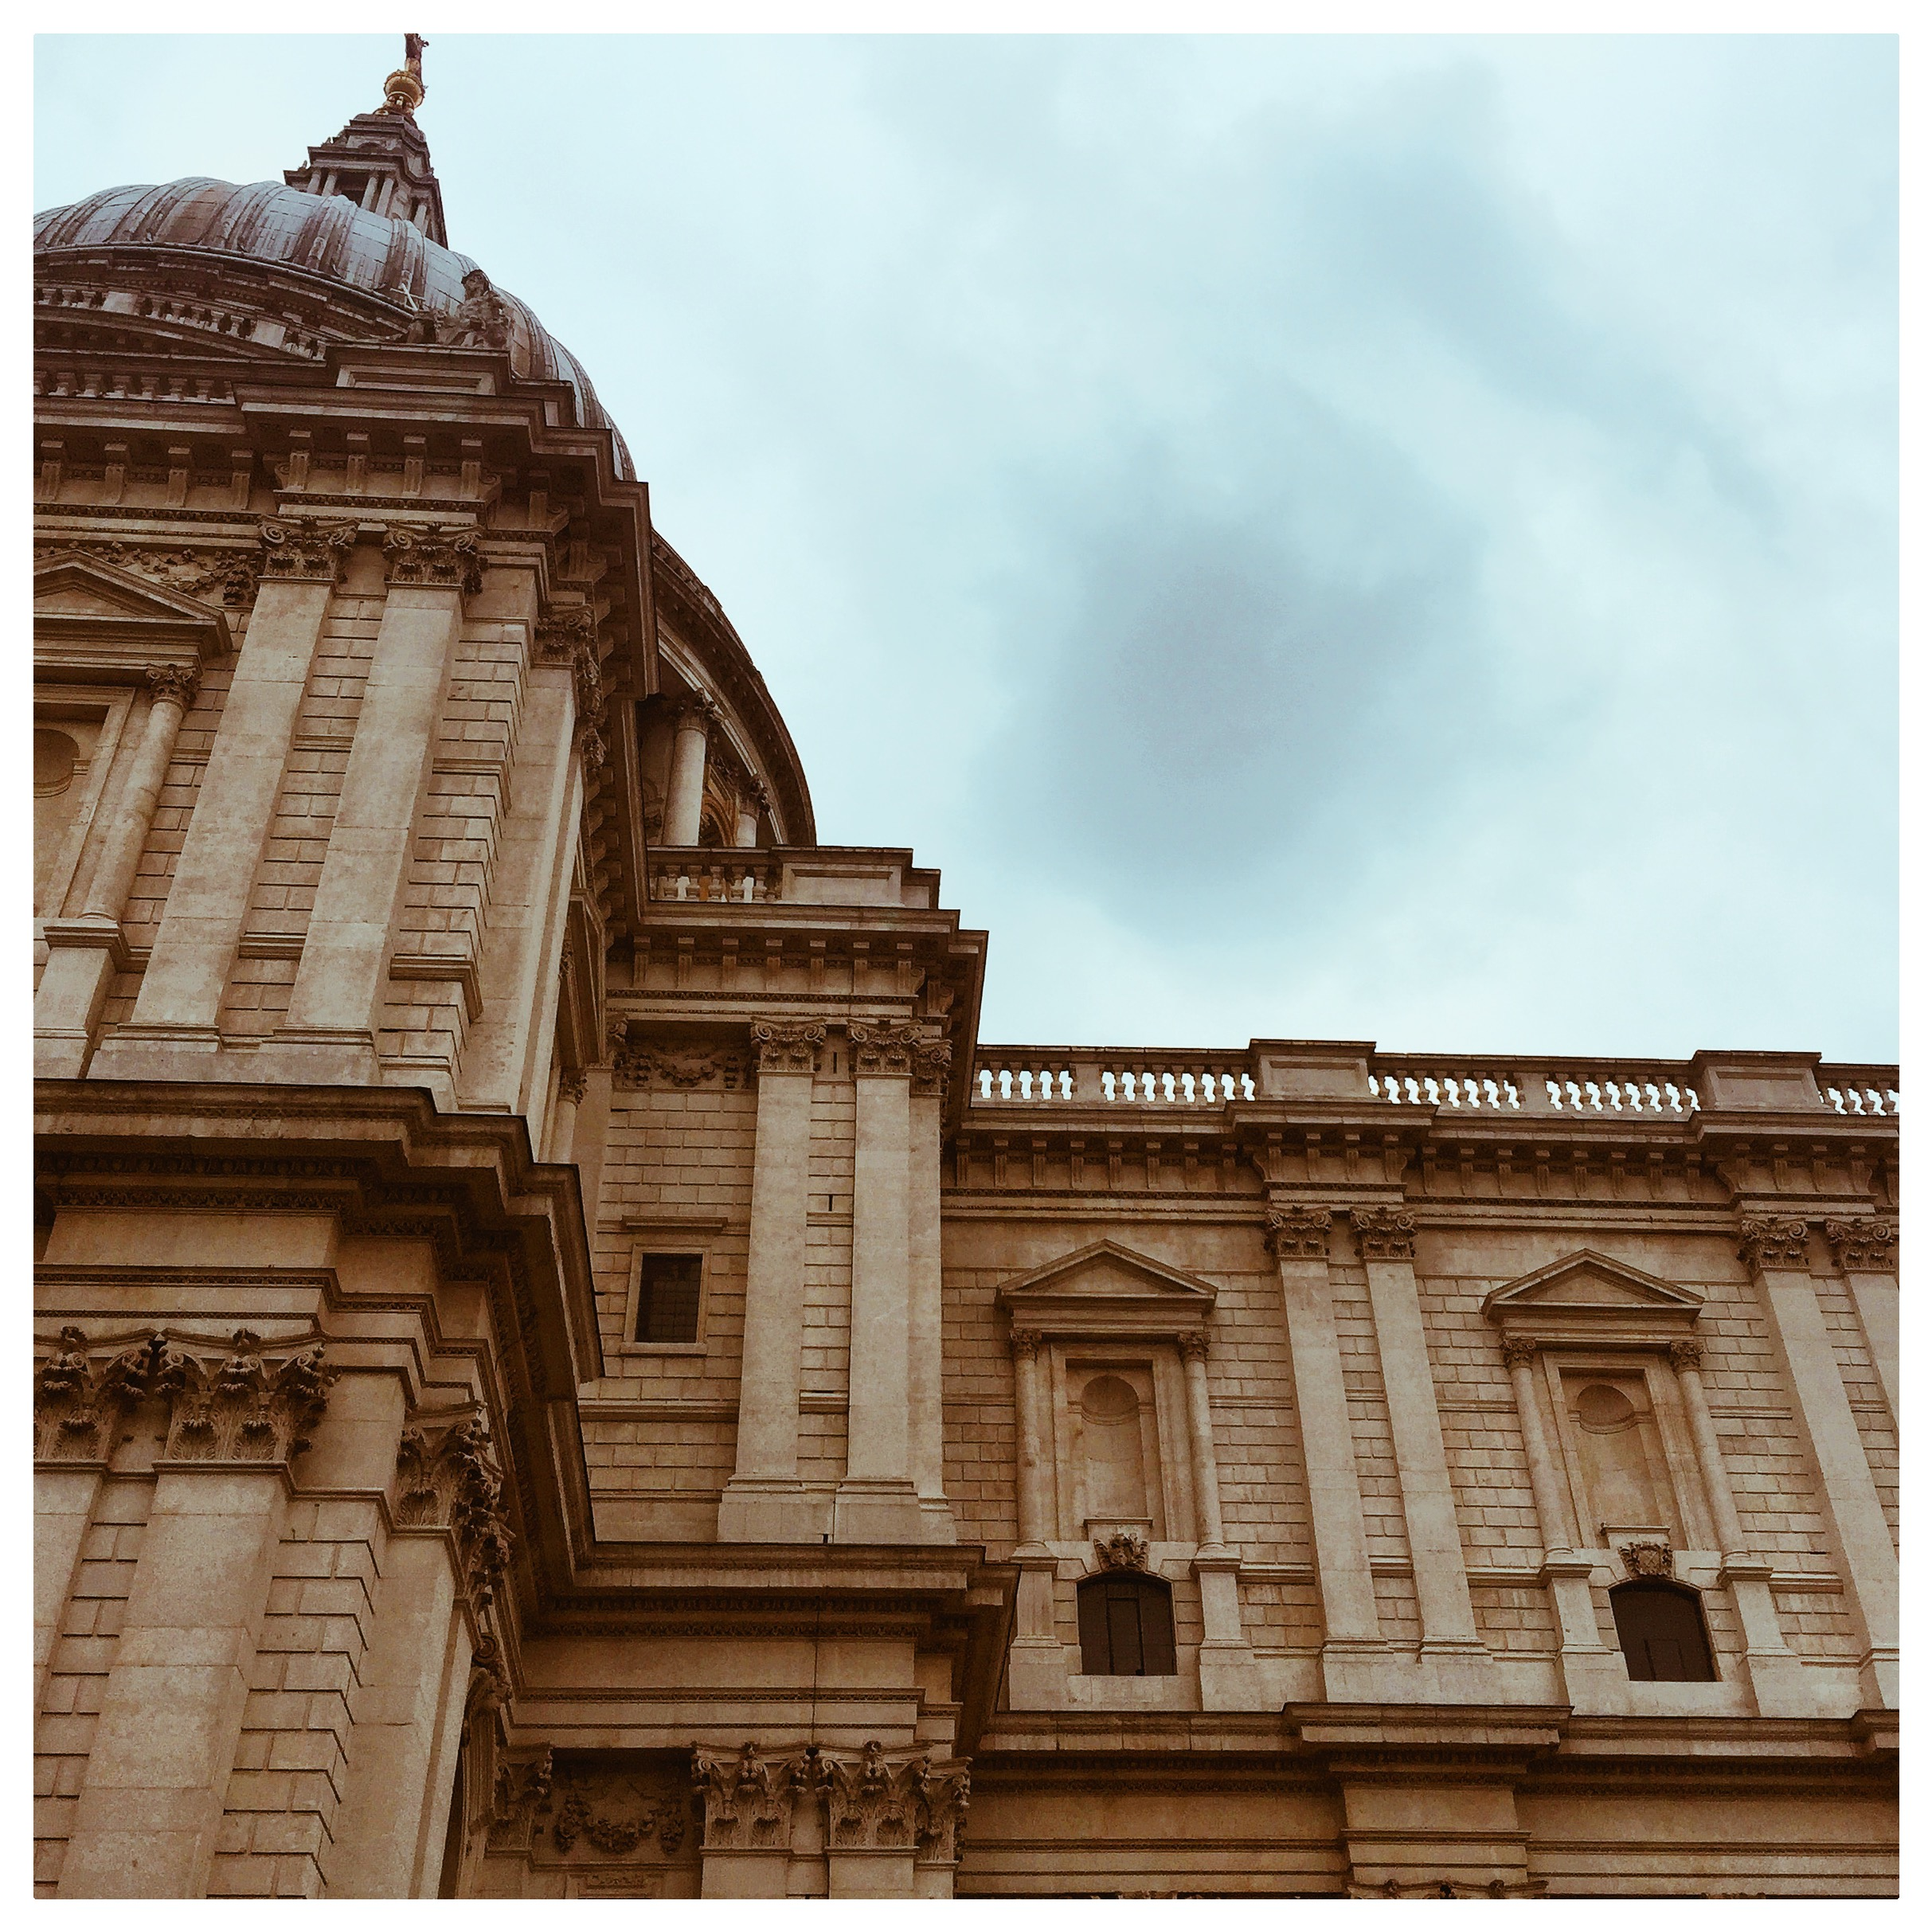 Skies over St. Paul's